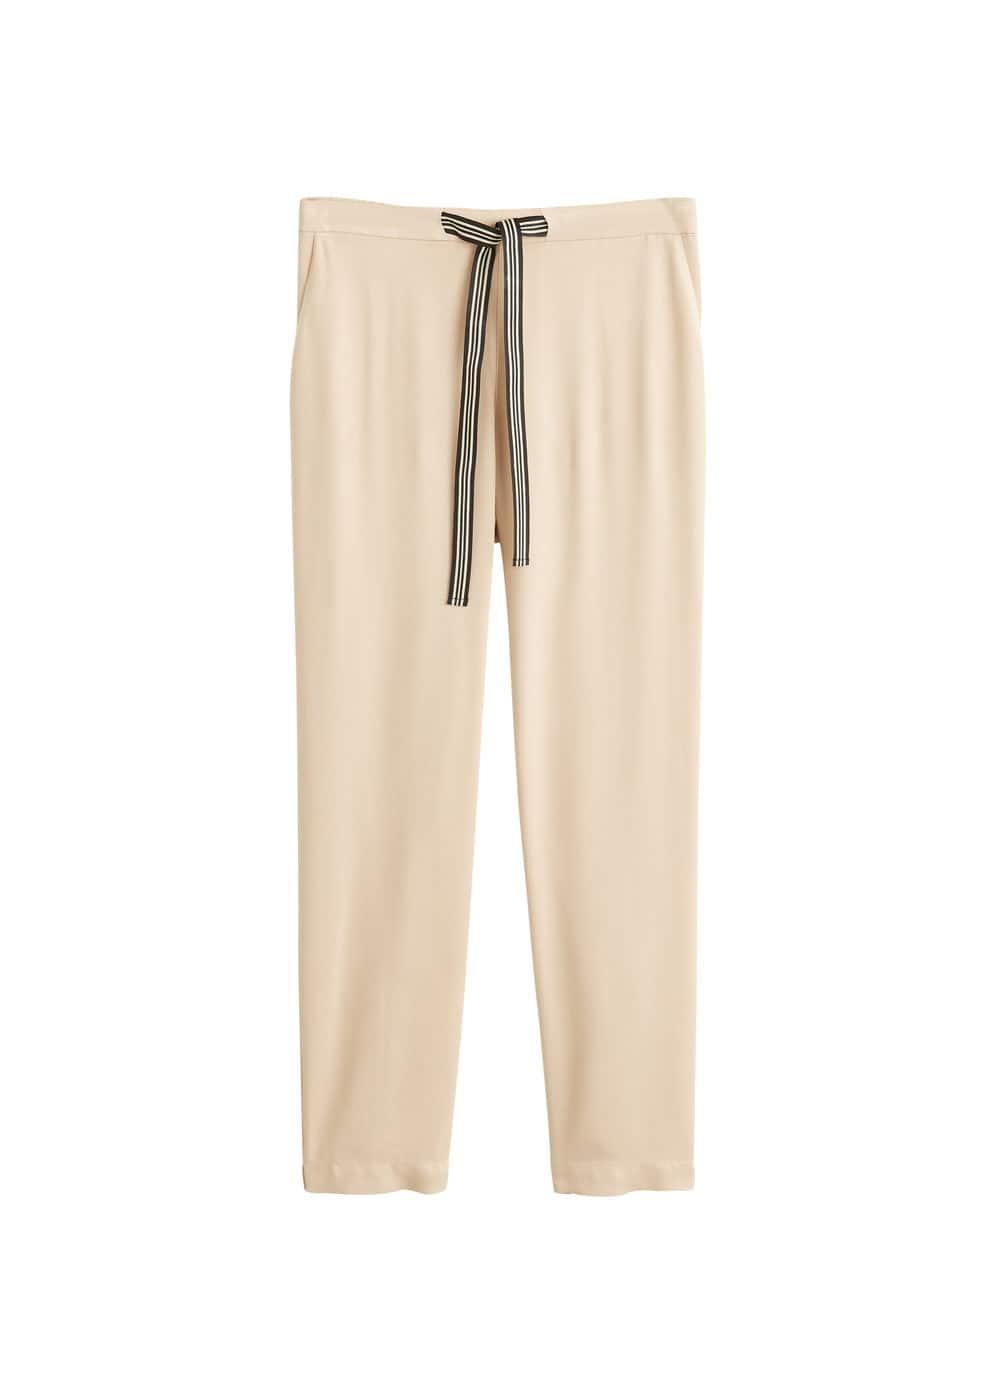 m-fluido:pantalon largo recto